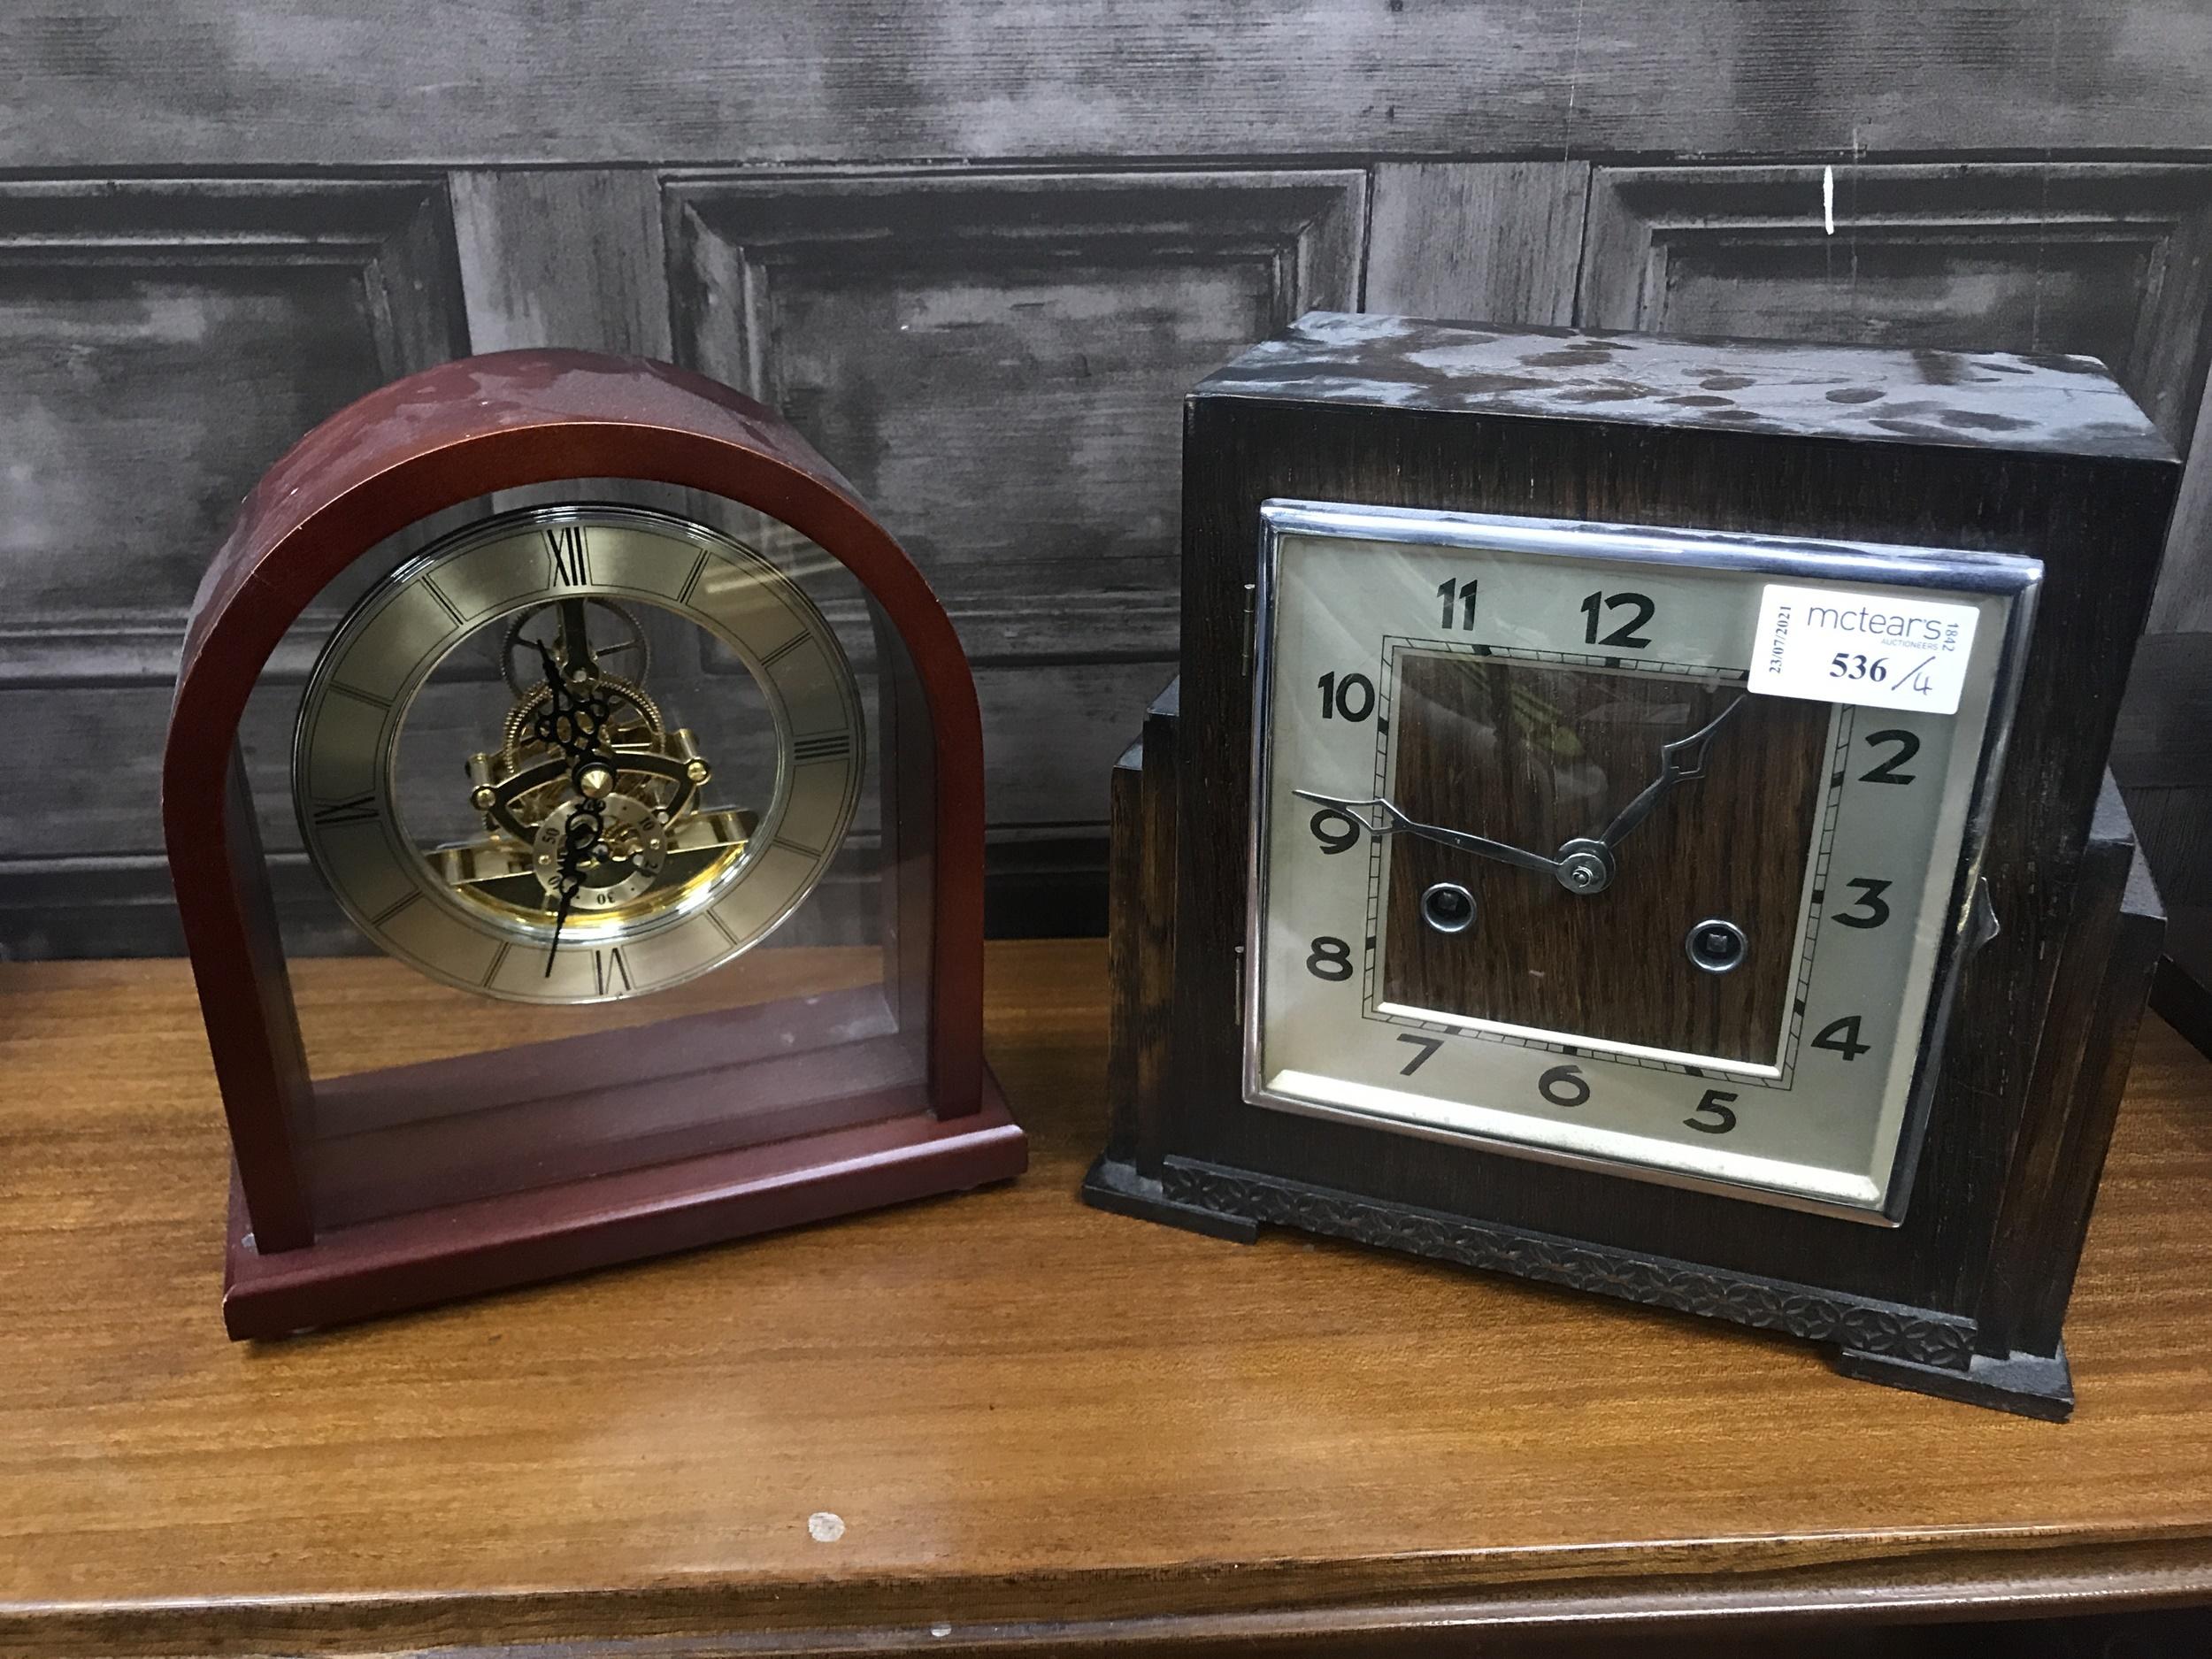 AN OAK ART DECO STYLE MANTEL CLOCK AND THREE OTHER CLOCKS